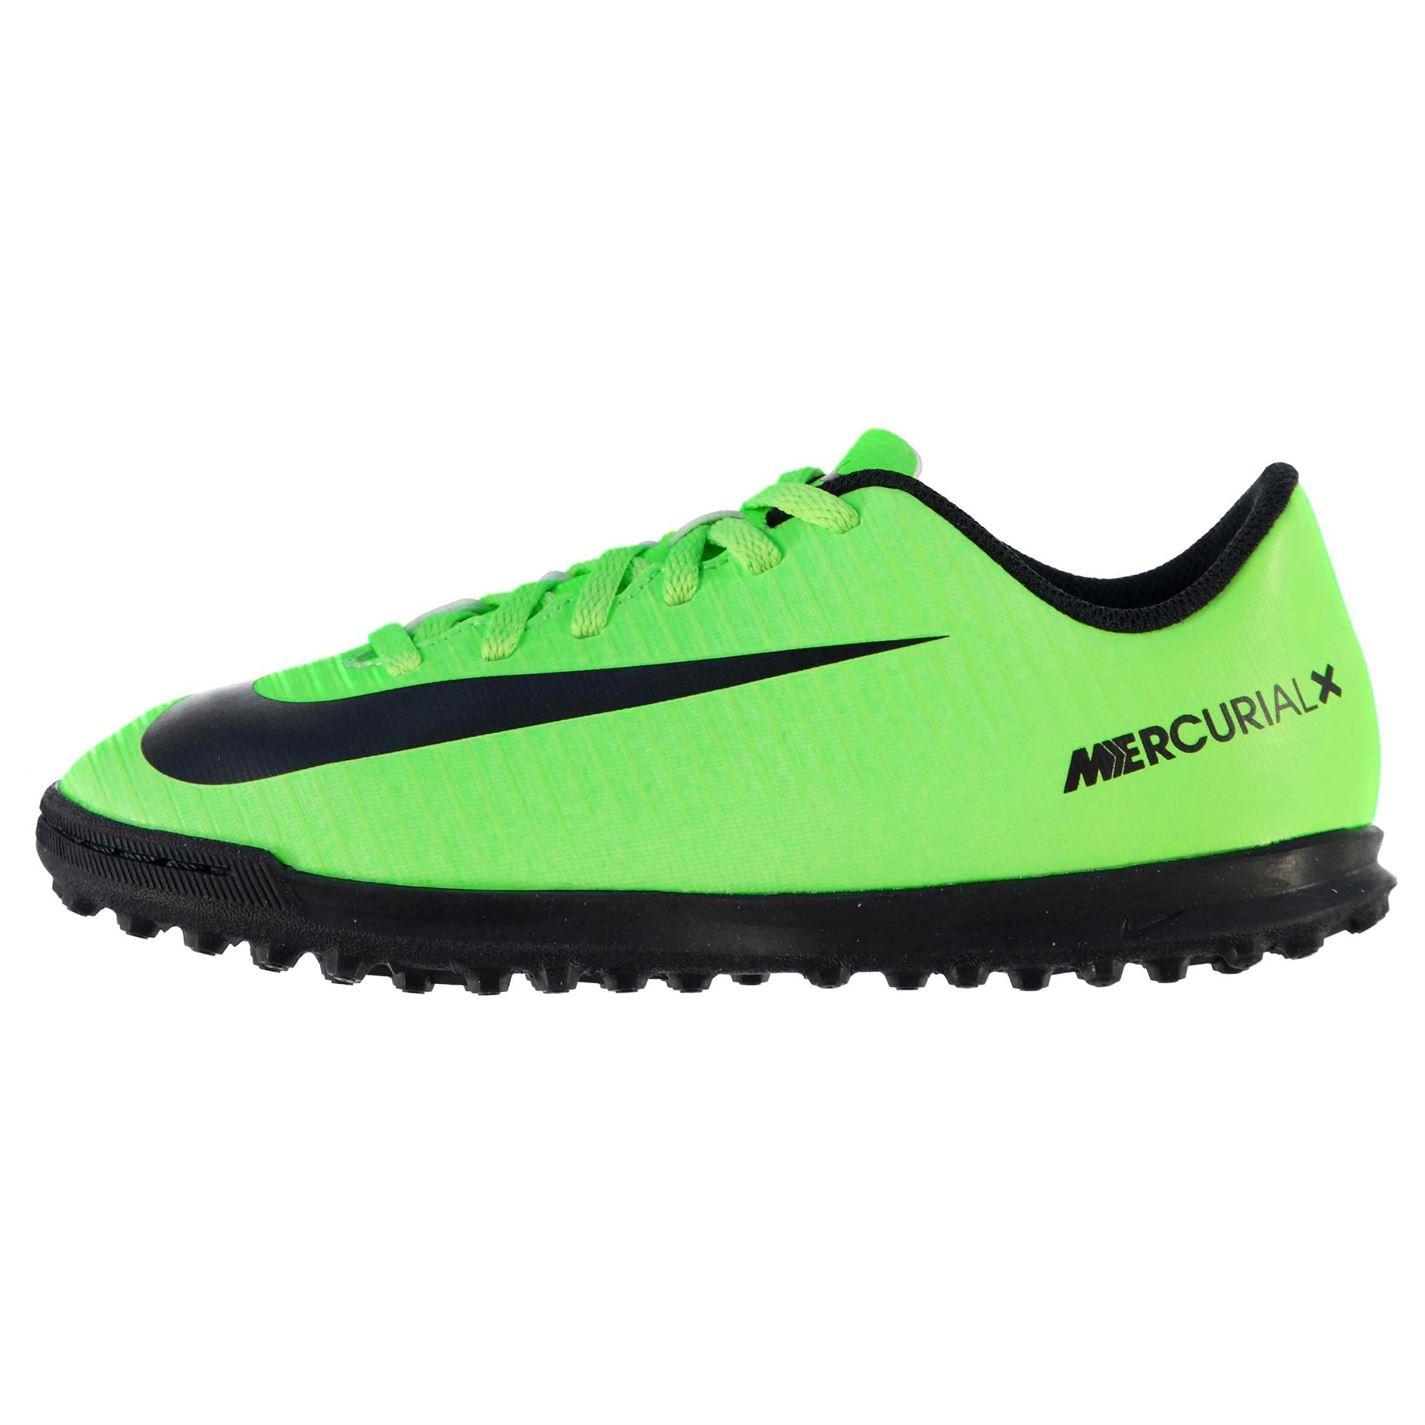 f79e9e70f2 Nike mercurial vortex junior astro turf levně | Blesk zboží